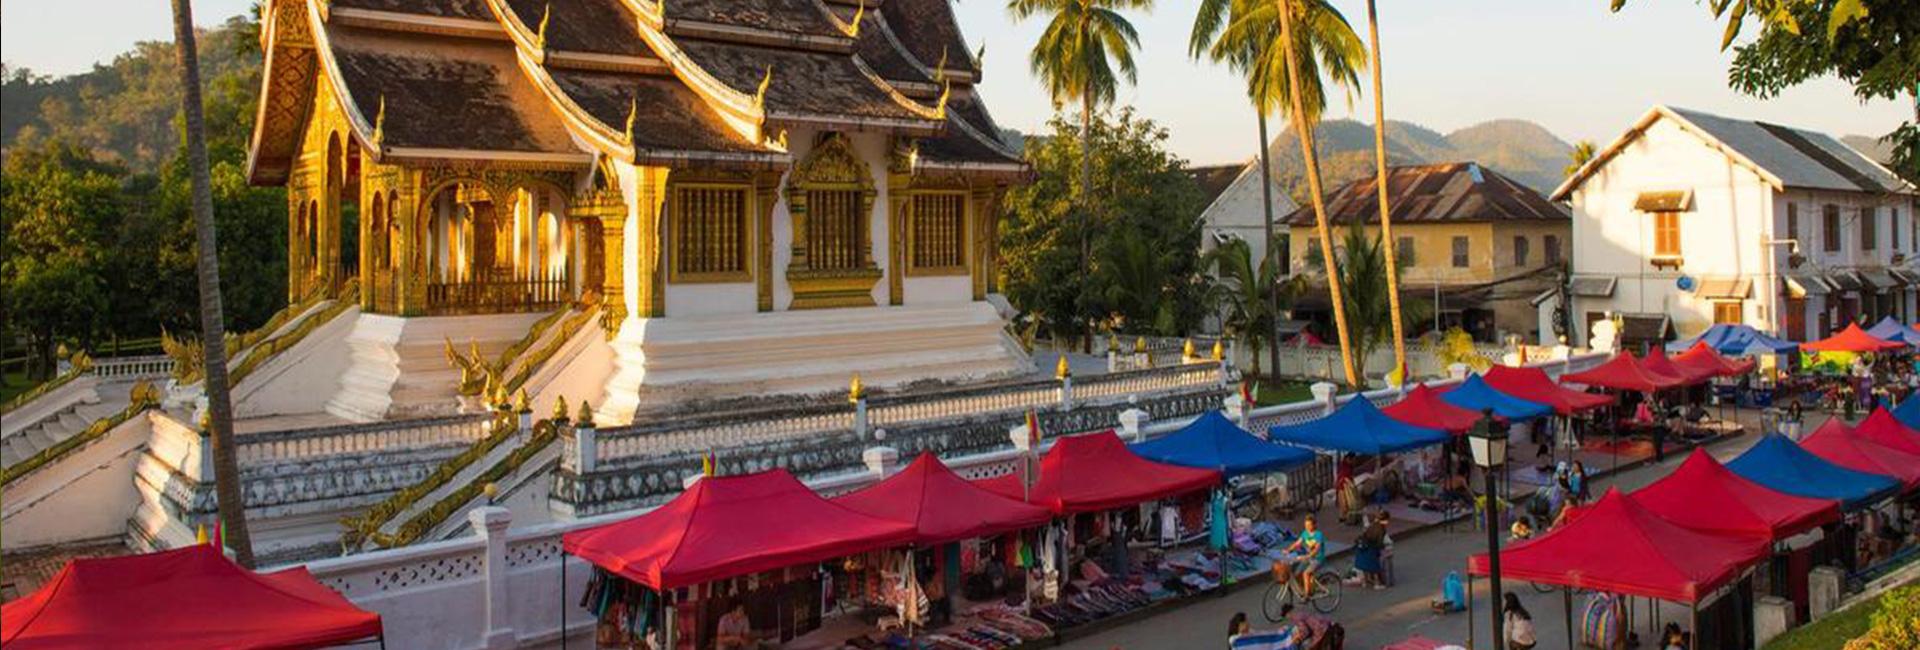 Top 5 must-try Luang Prabang street foods